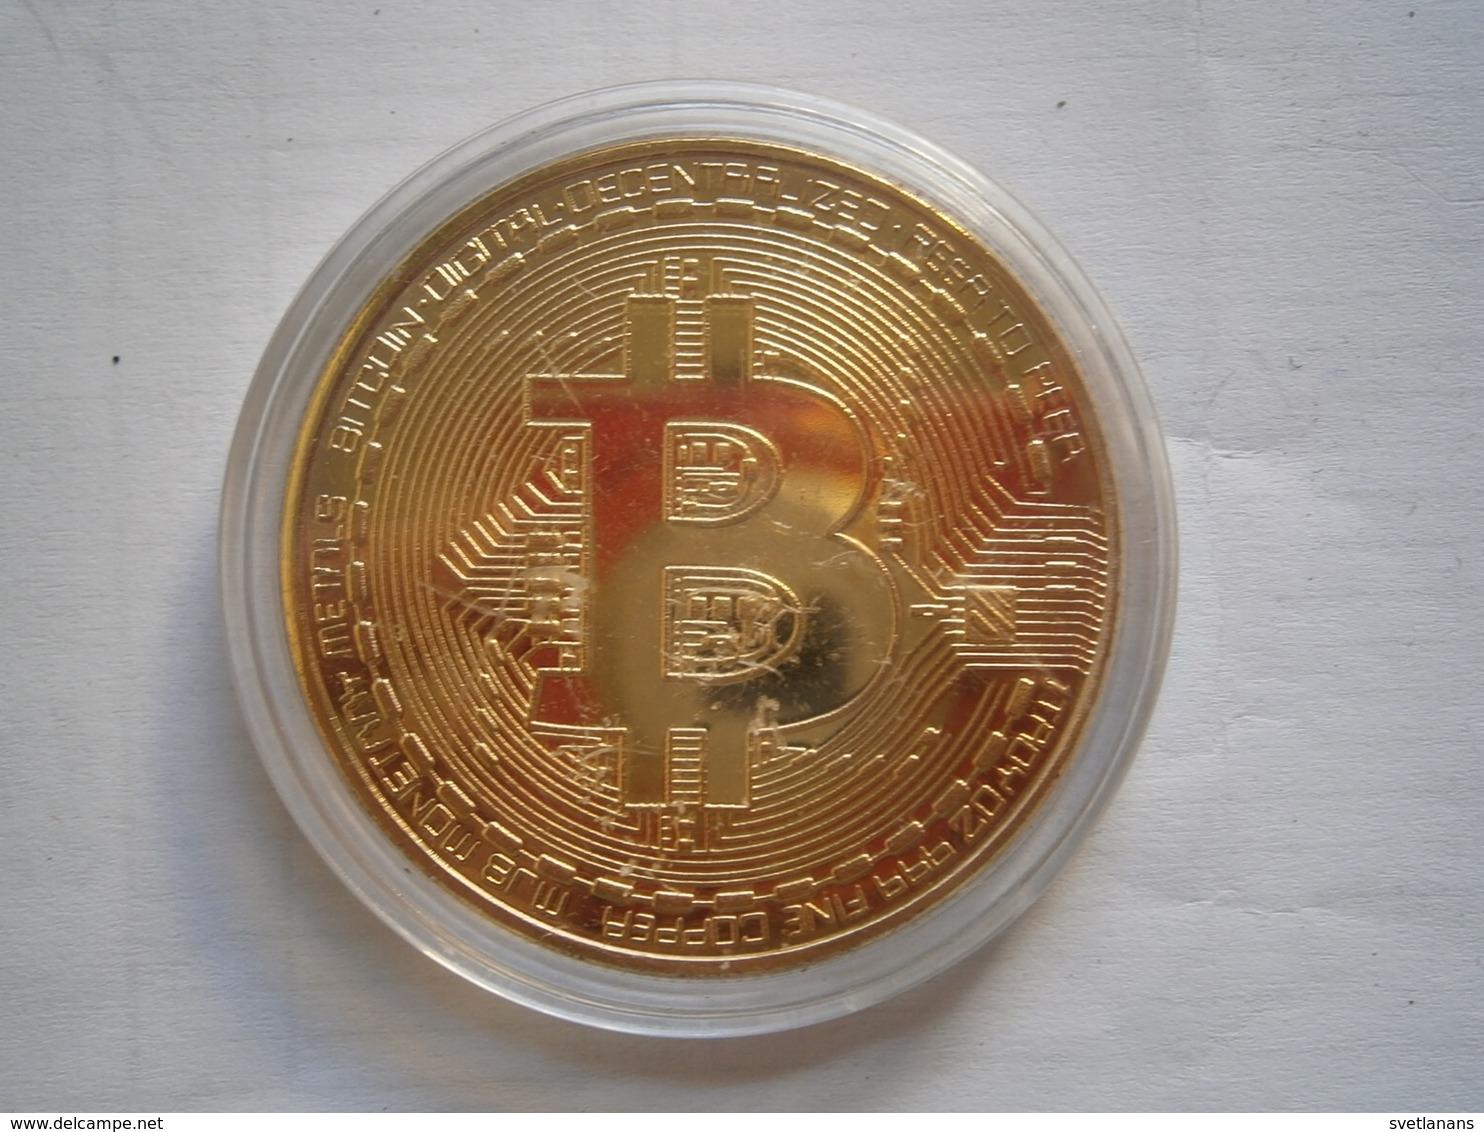 Bitcoin BTC 2013 ROCS APPROVED Commemorative Round Collectors Coin Bit Coin Plastic Case Not Gold Digital Era Souvenir - Other Coins